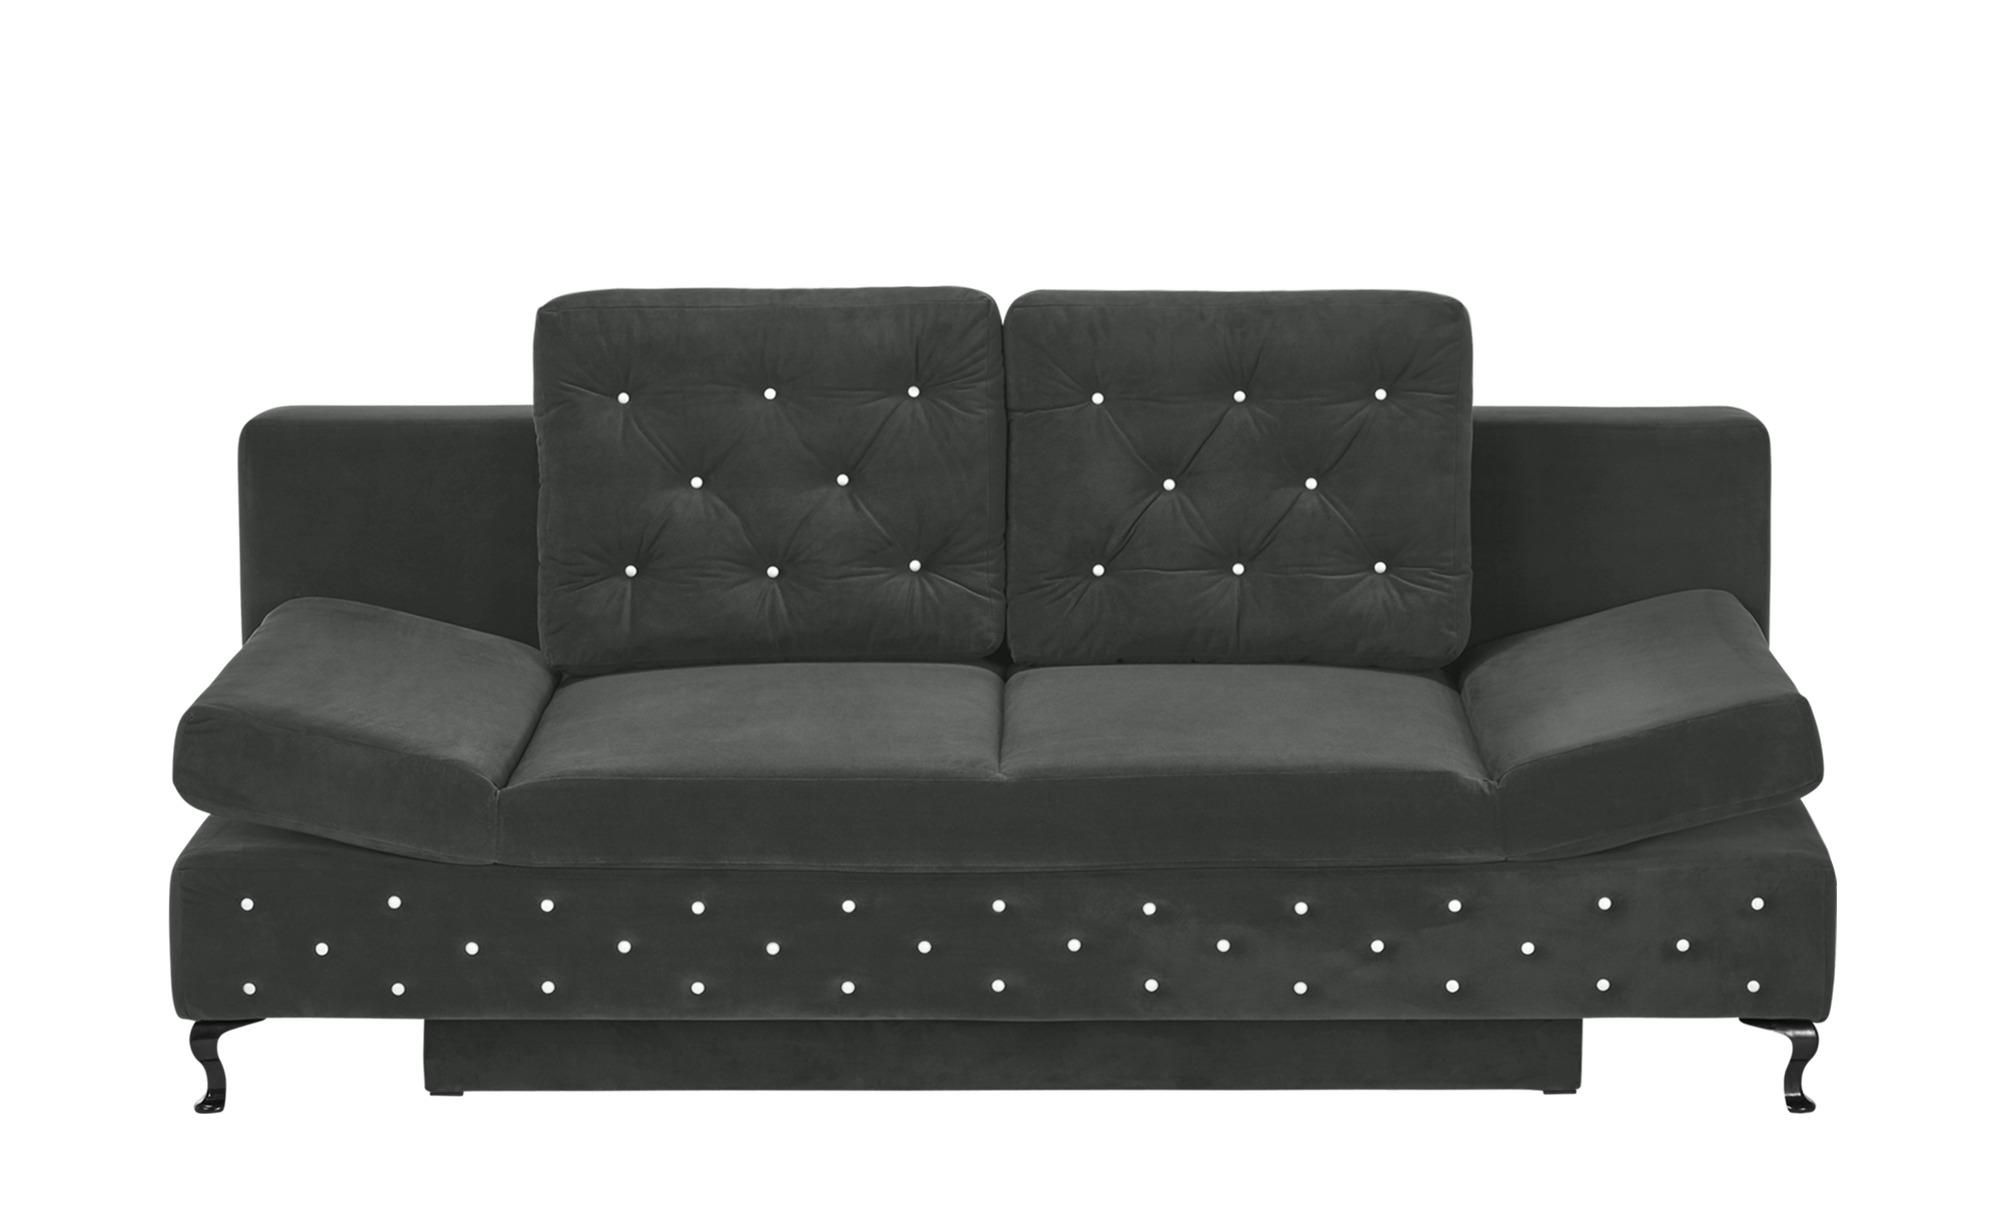 switch schlafsofa riviera breite 202 cm h he 75 cm grau. Black Bedroom Furniture Sets. Home Design Ideas